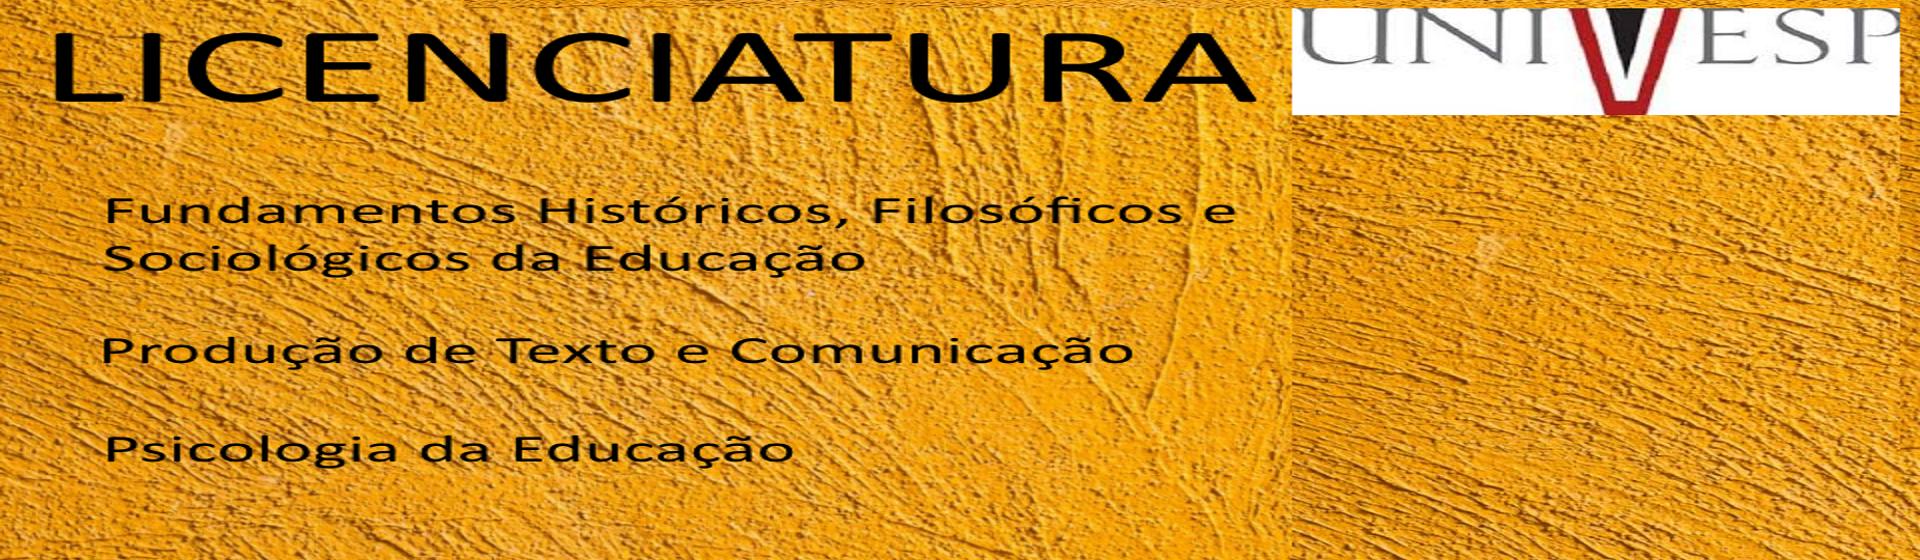 Banner%20licenciatura%20bimestre%201